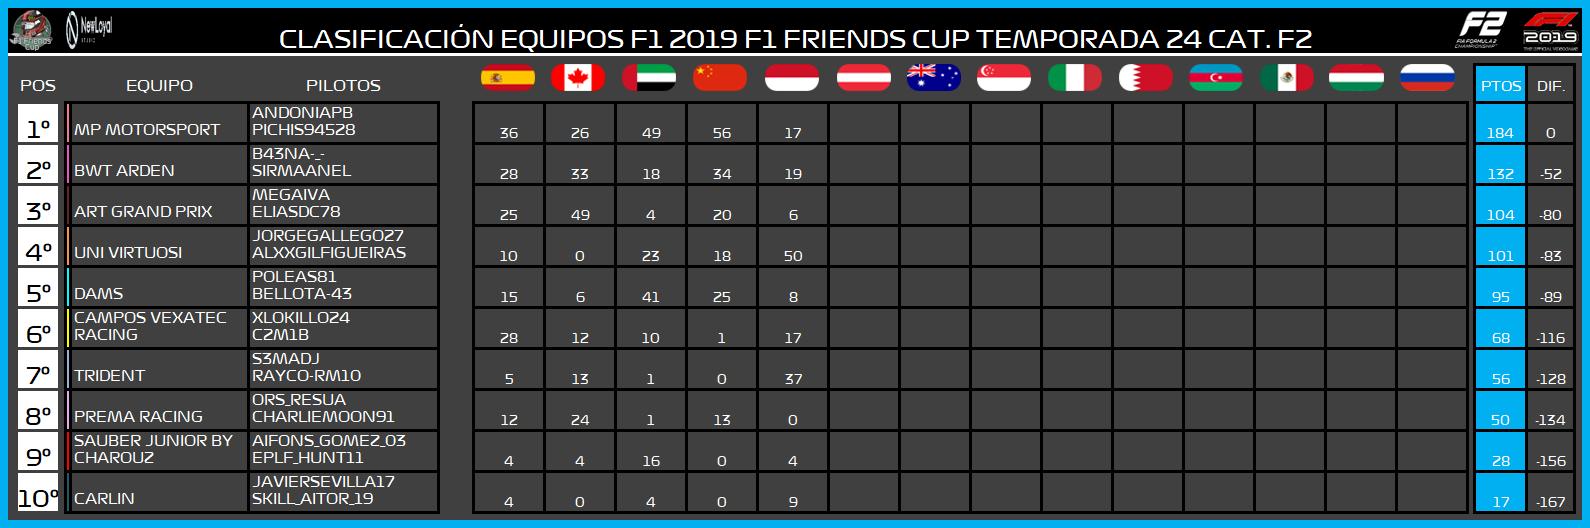 | F2 19 T. XXIV | Central de estadísticas de la Temporada 24 F2 2019 9112